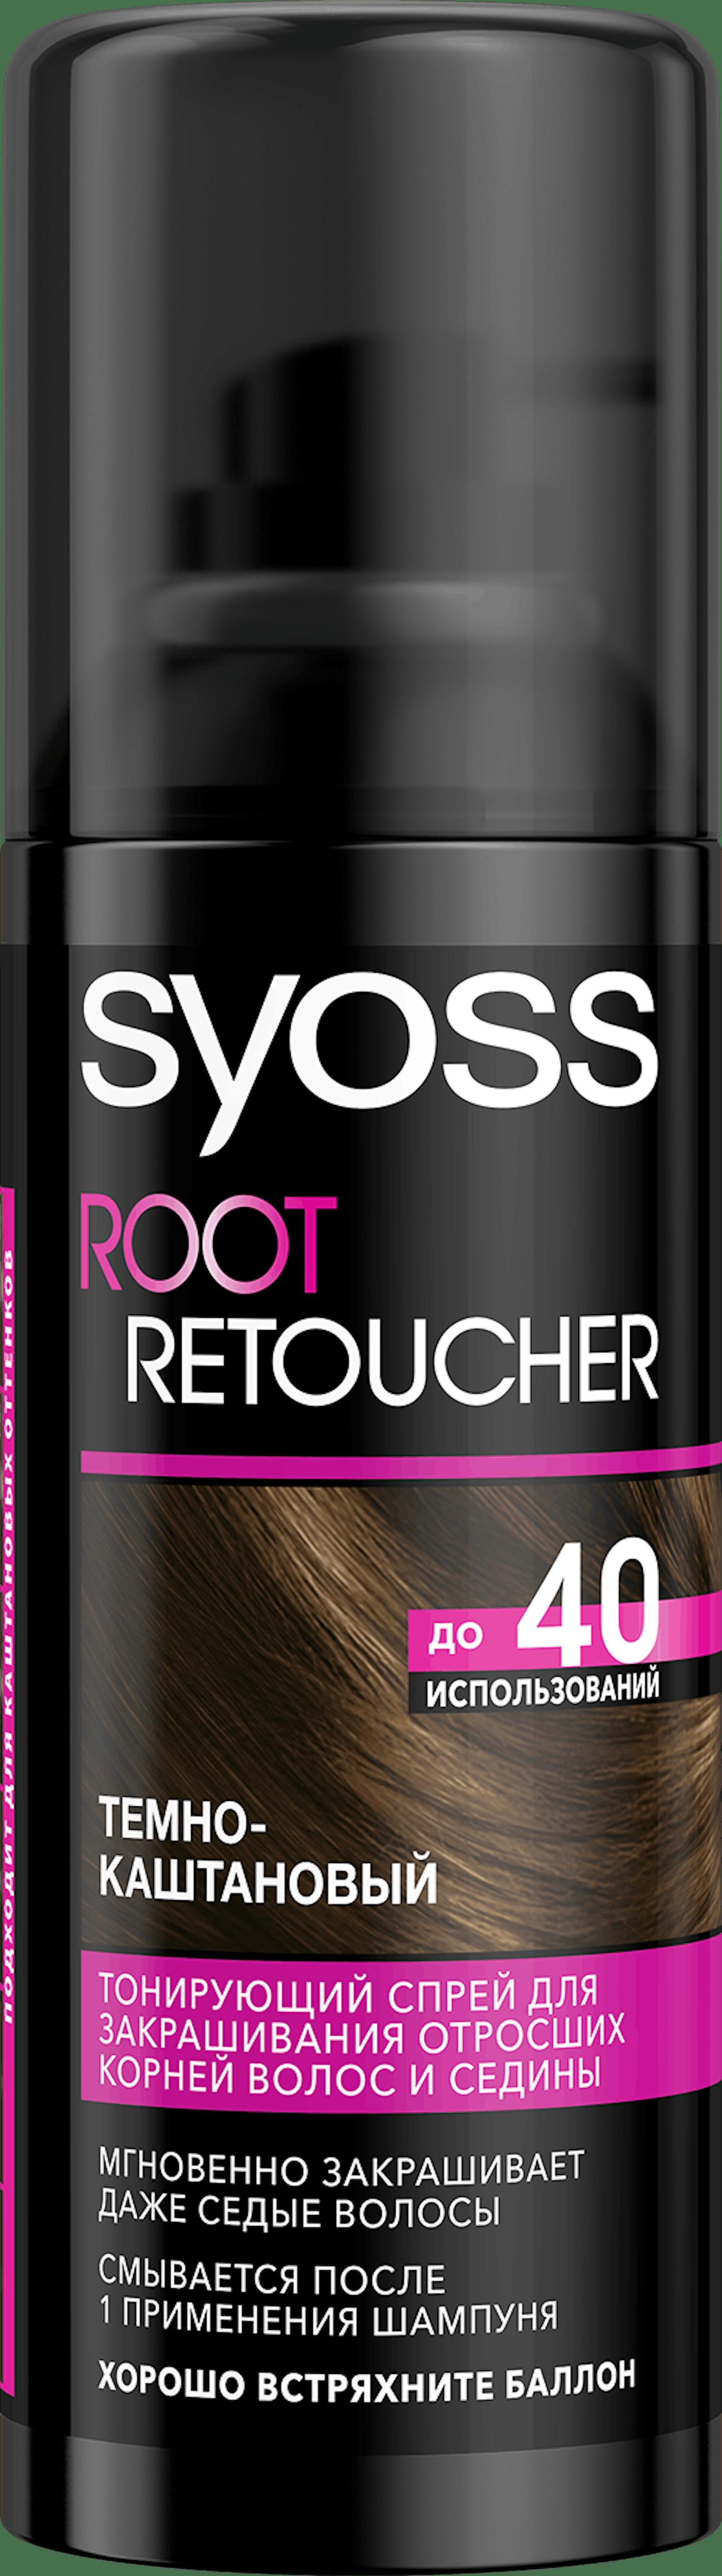 Syoss Root Retoucher Темно-каштановий